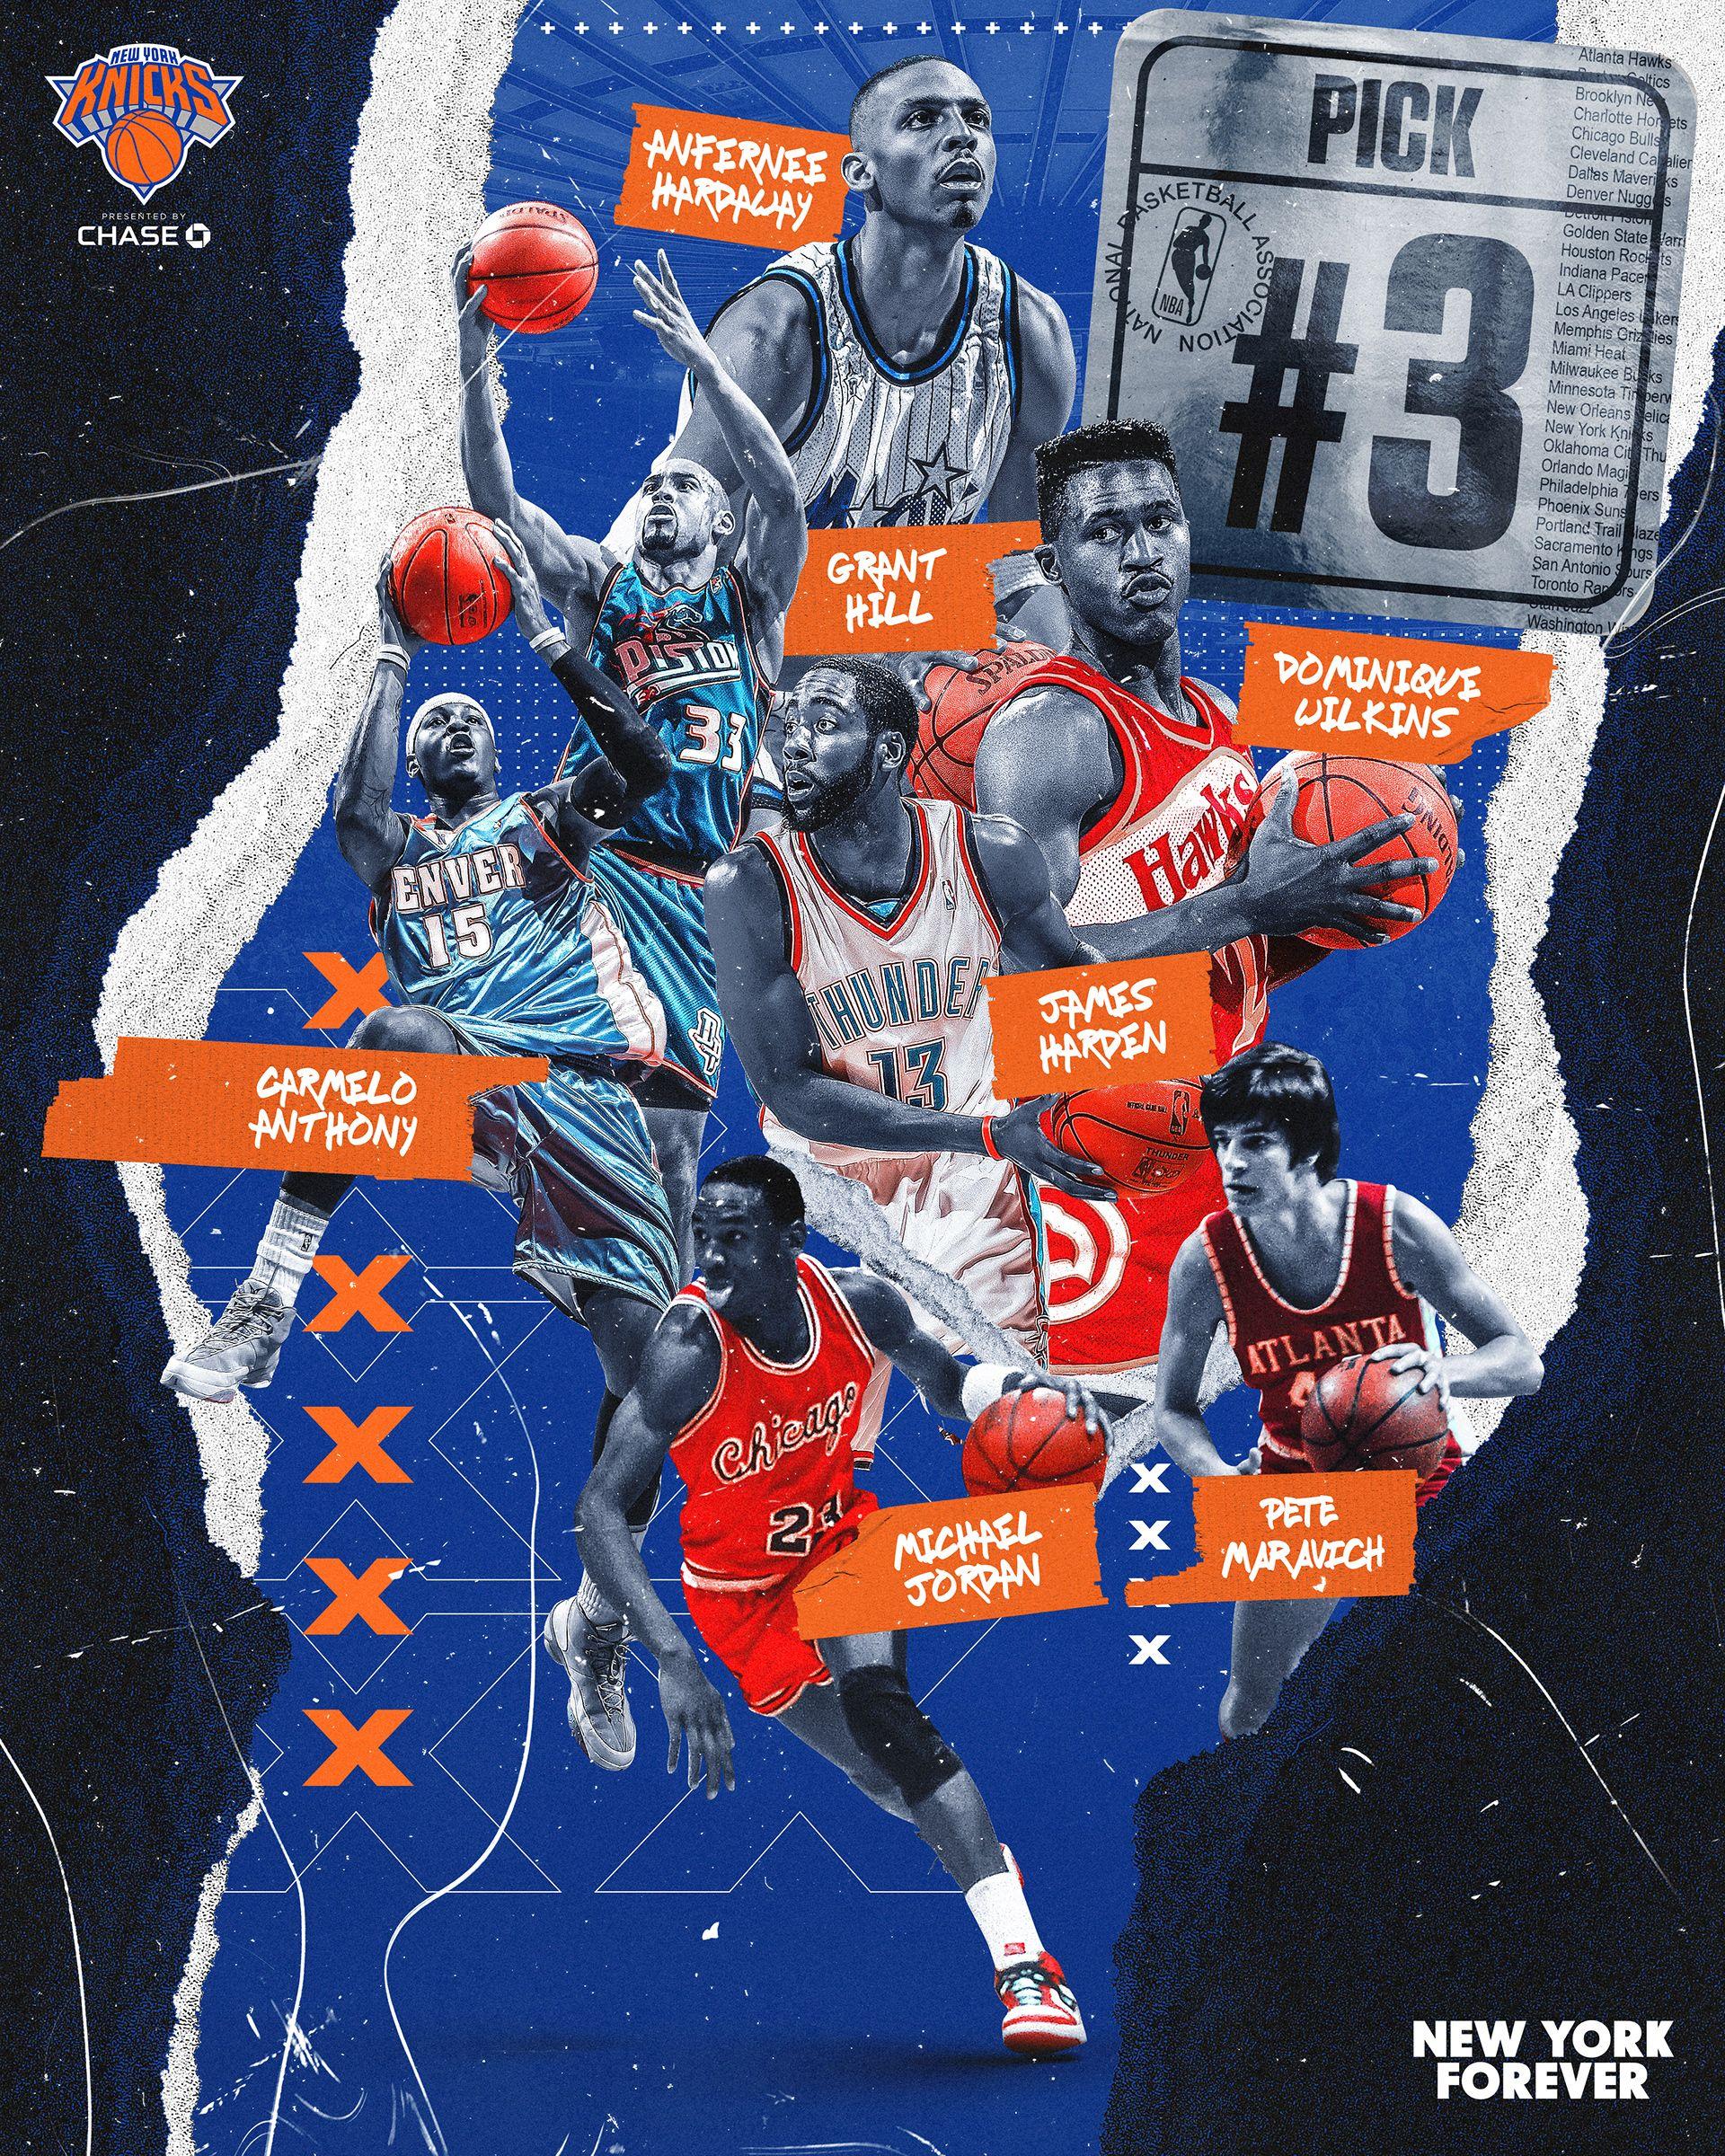 New York Knicks Former 3 Nba Draft Picks On Behance Sports Graphic Design New York Knicks Sports Design Inspiration